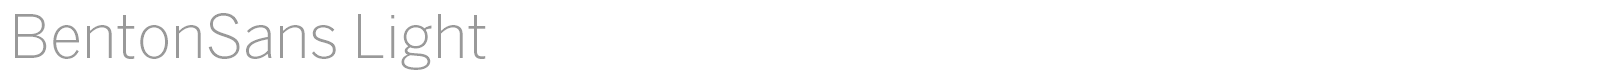 Download Free Font BentonSans Light